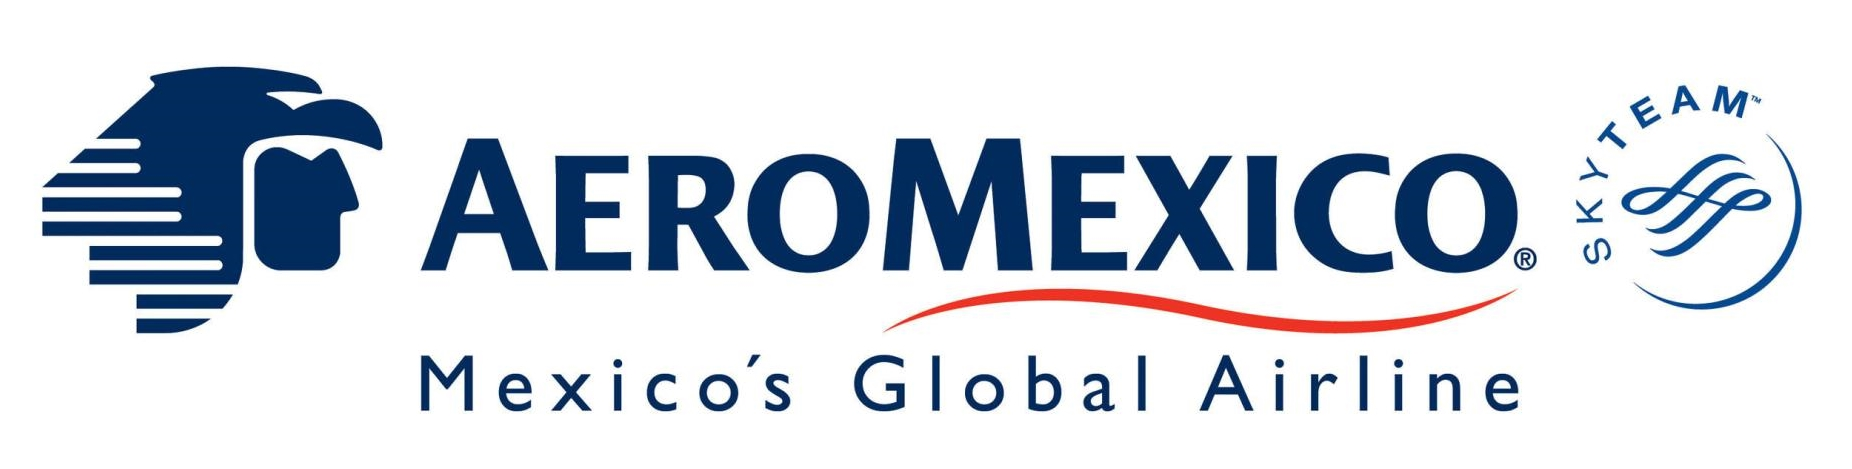 Aeromexico_logotype_2